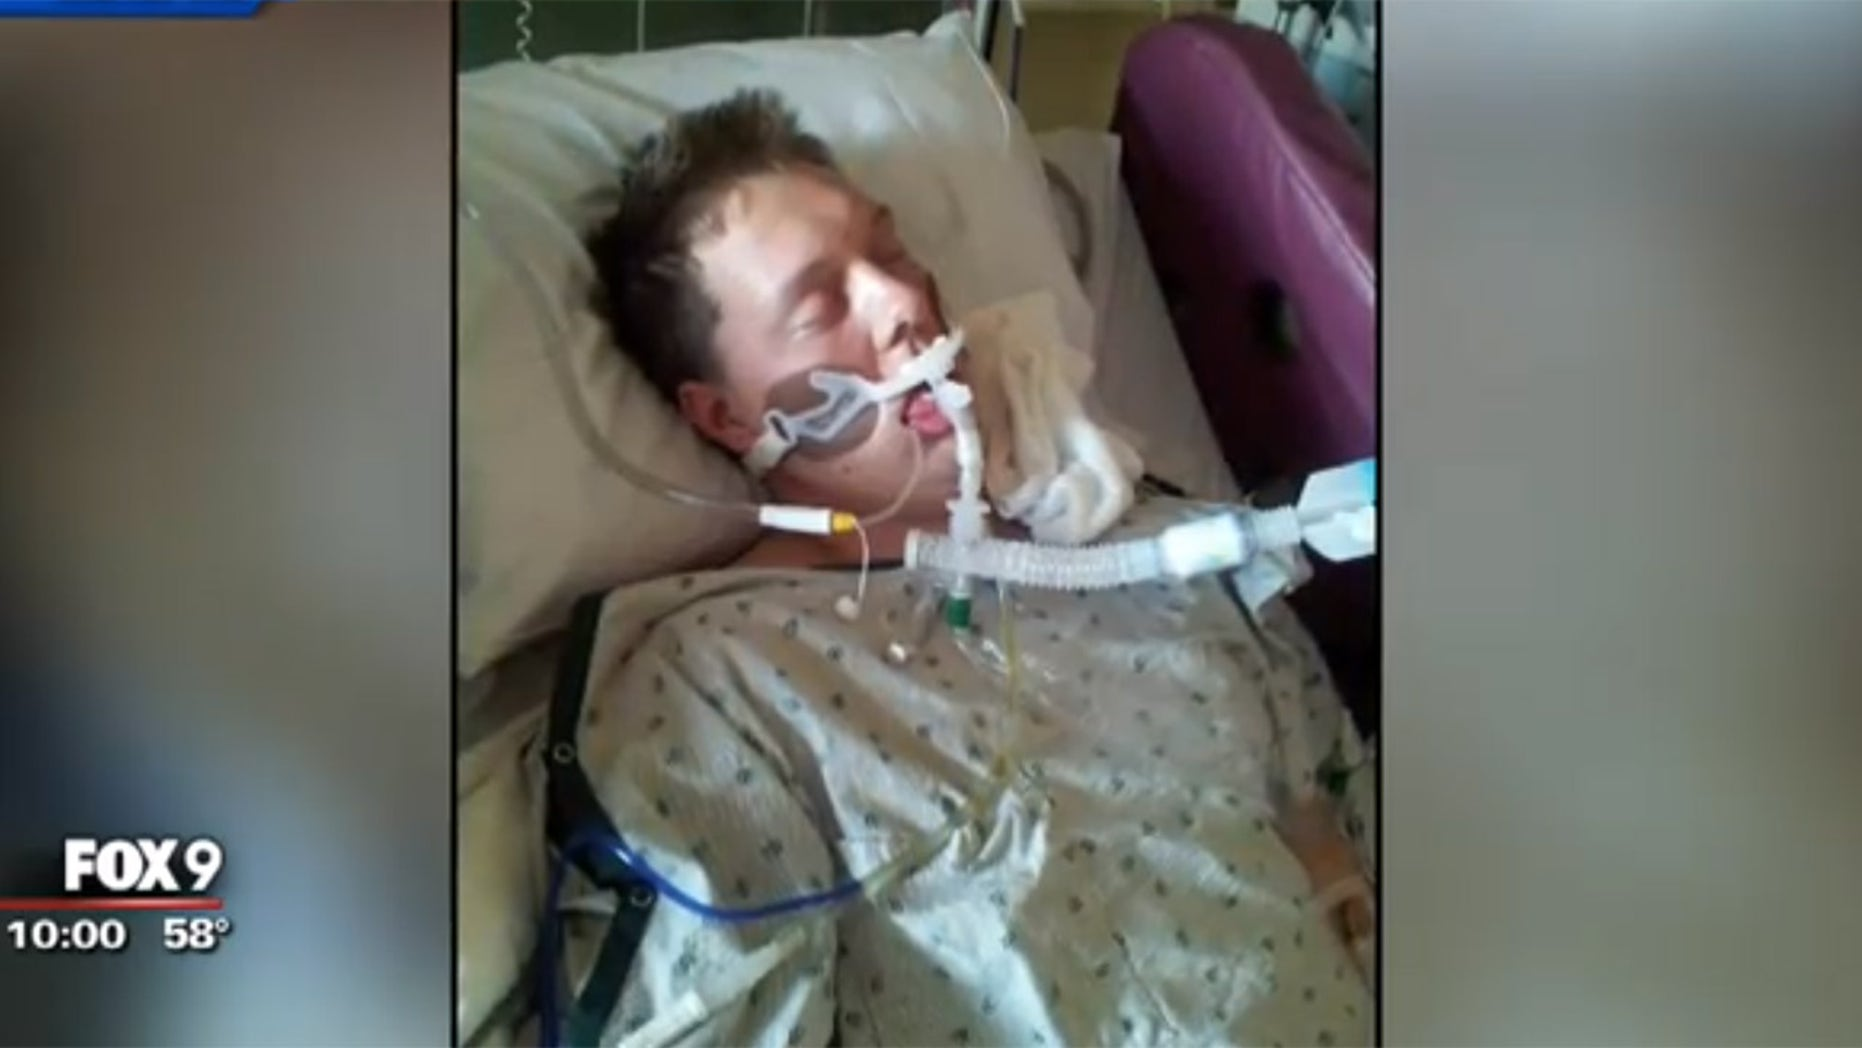 Kyle Donovan estimates he spent $30,000 on K2 before his overdose.